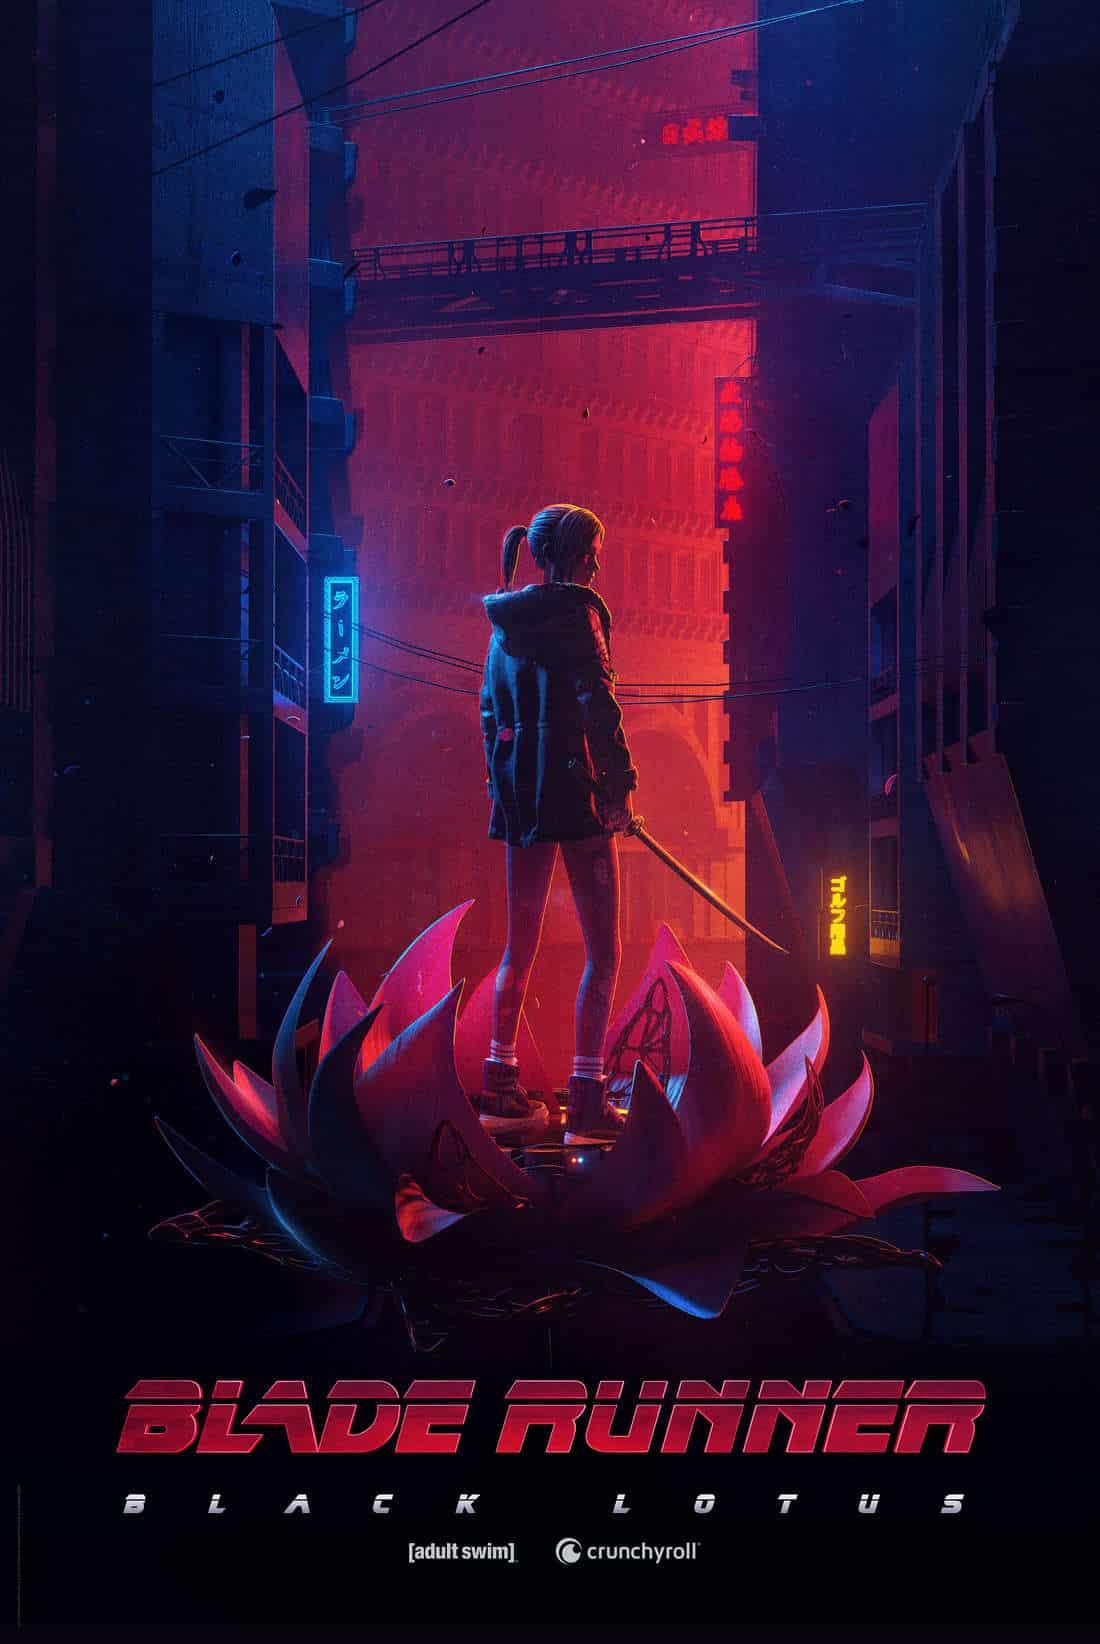 Blade Runner: Black Lotus estrena tráiler y póster